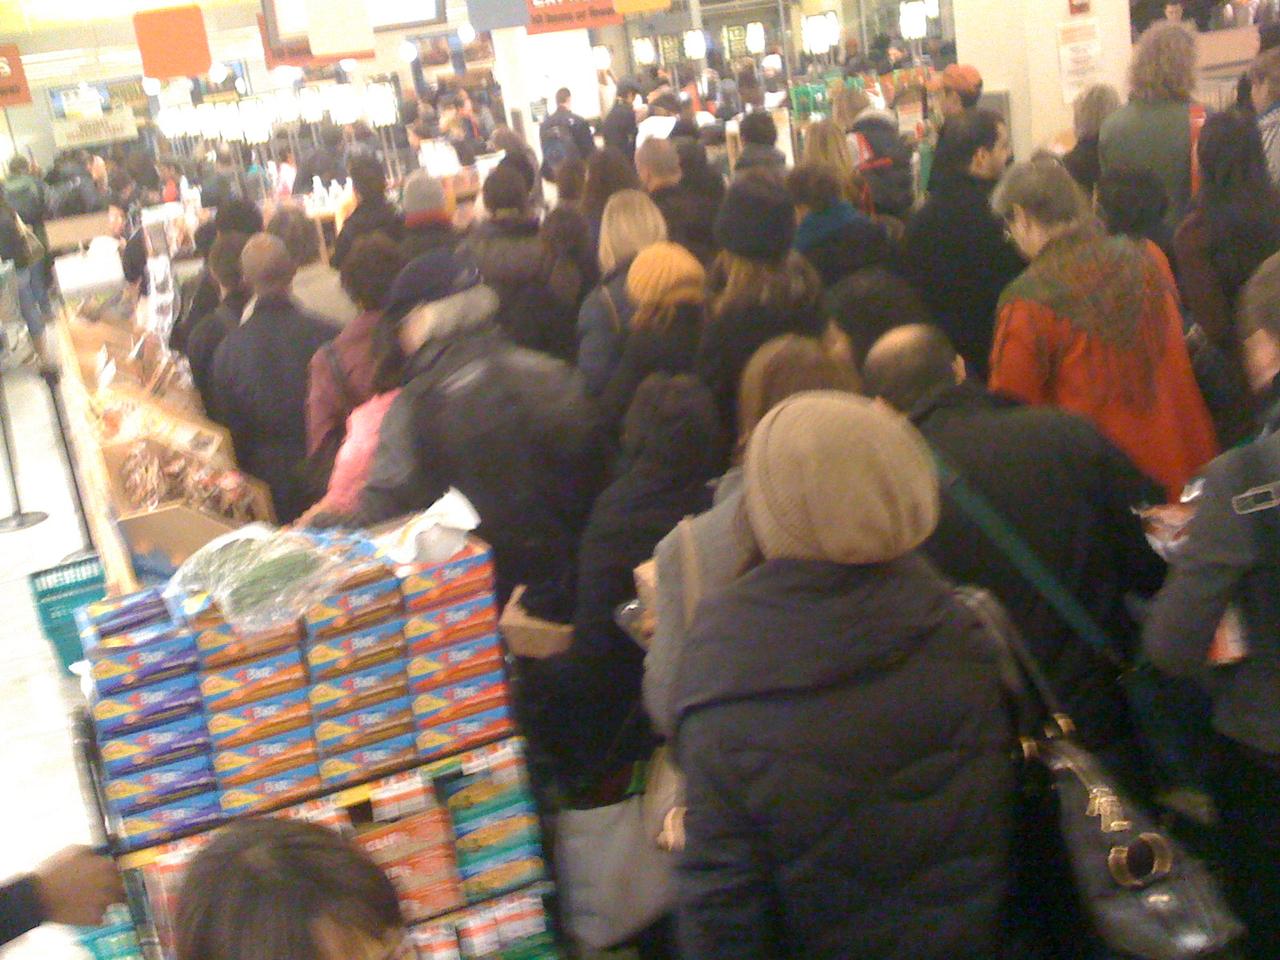 Whole Foods Union Sq. 4:30pm.